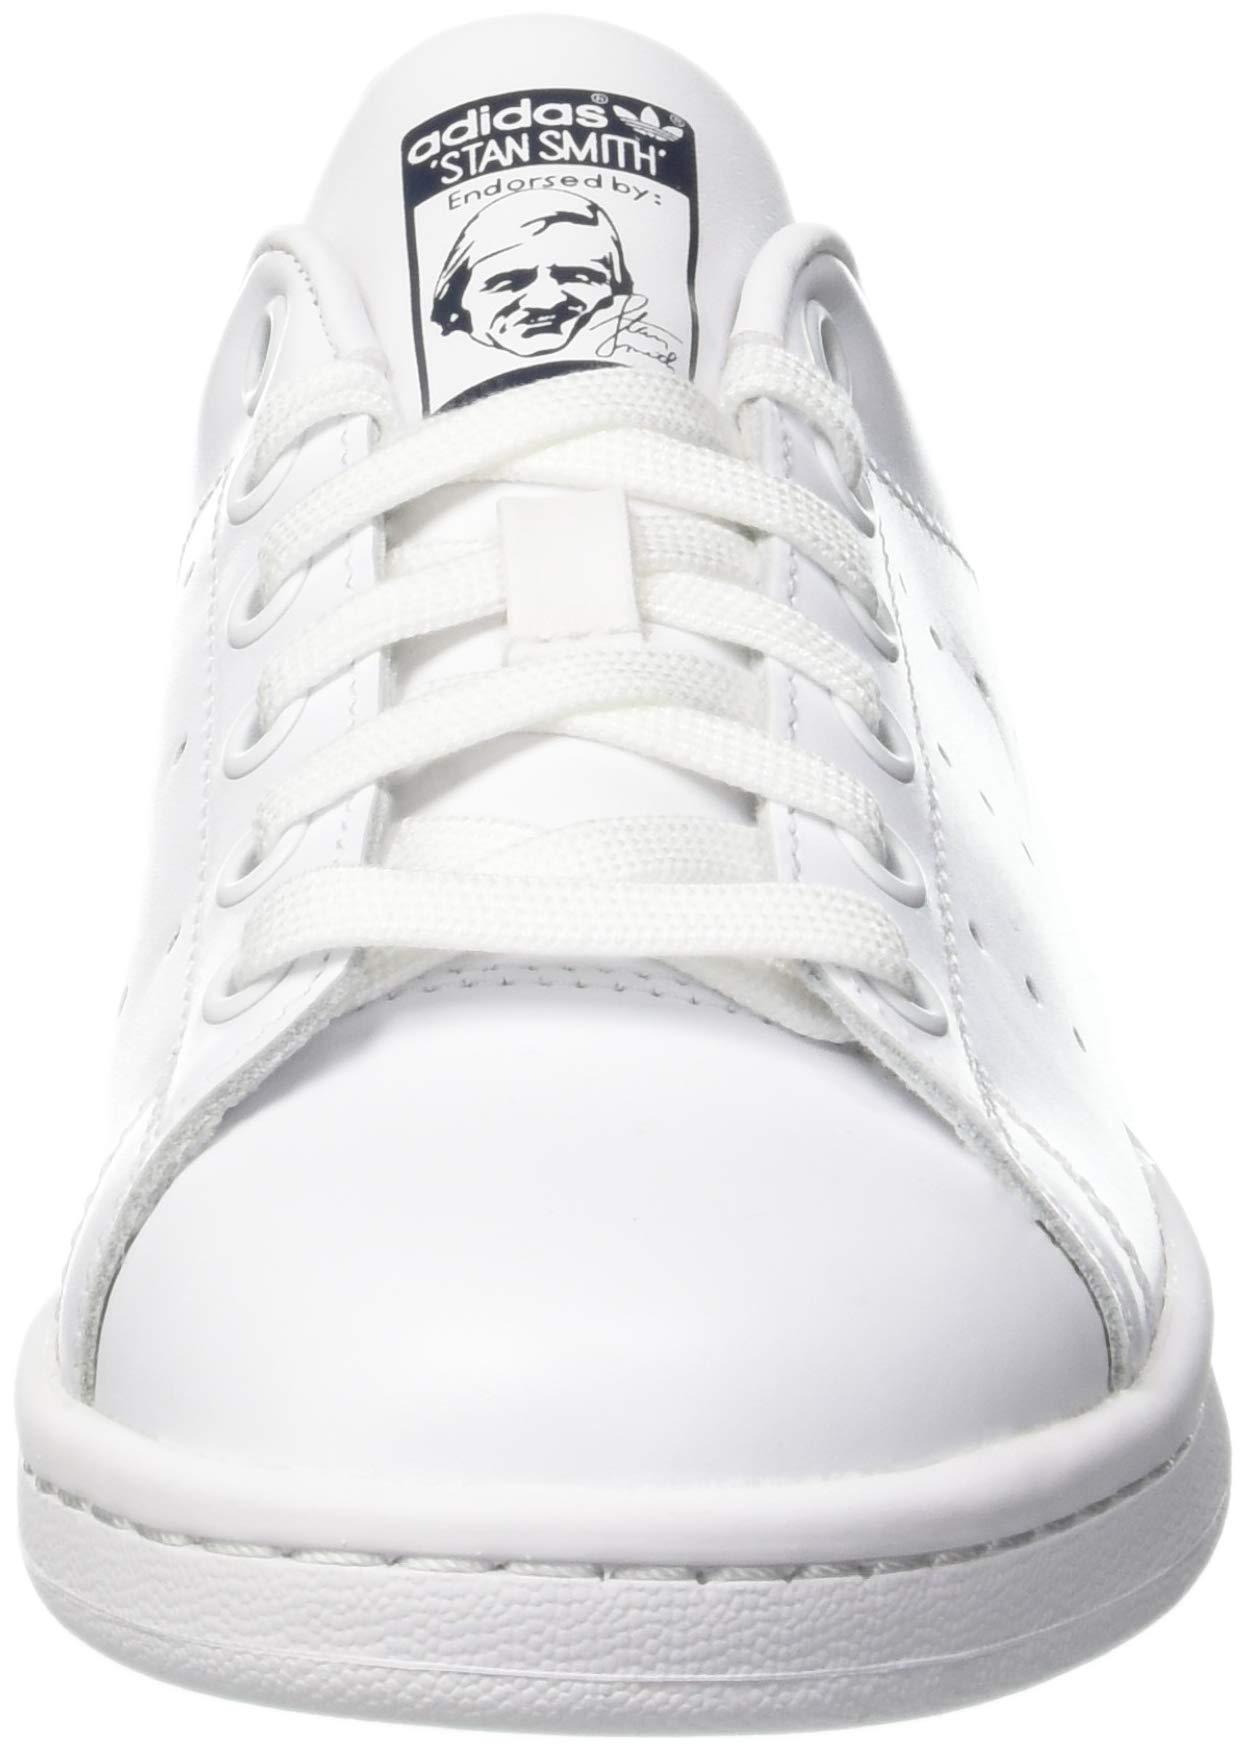 adidas Stan Smith, Scarpe da Tennis Unisex – Adulto 4 spesavip